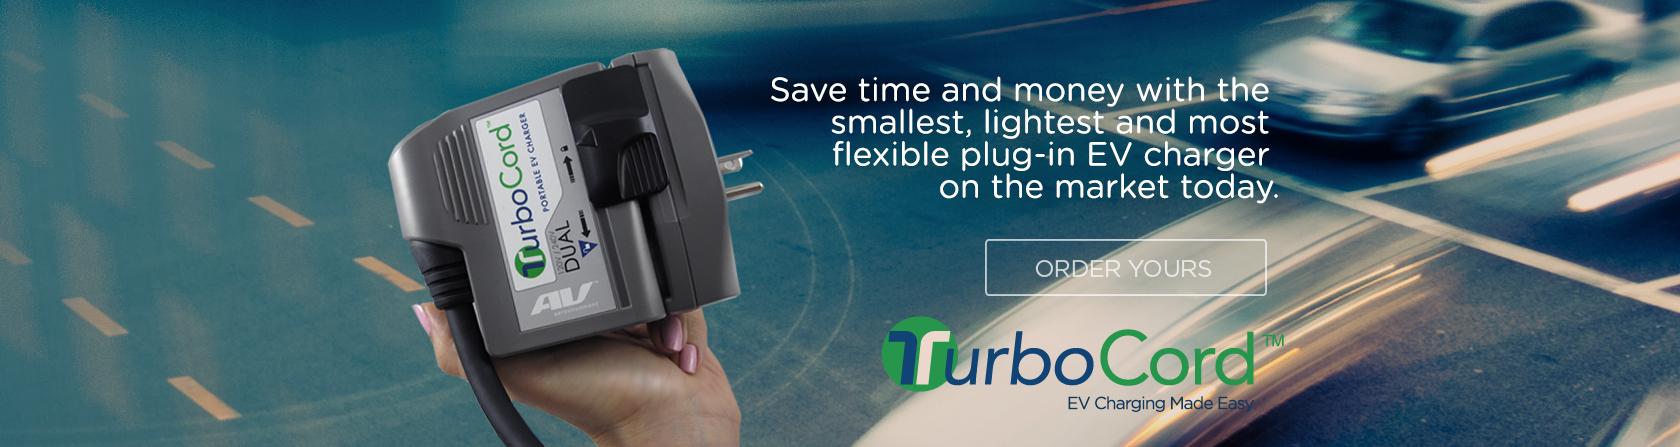 TurboCord | Smallest, Lightest & Most Flexible EV Charger